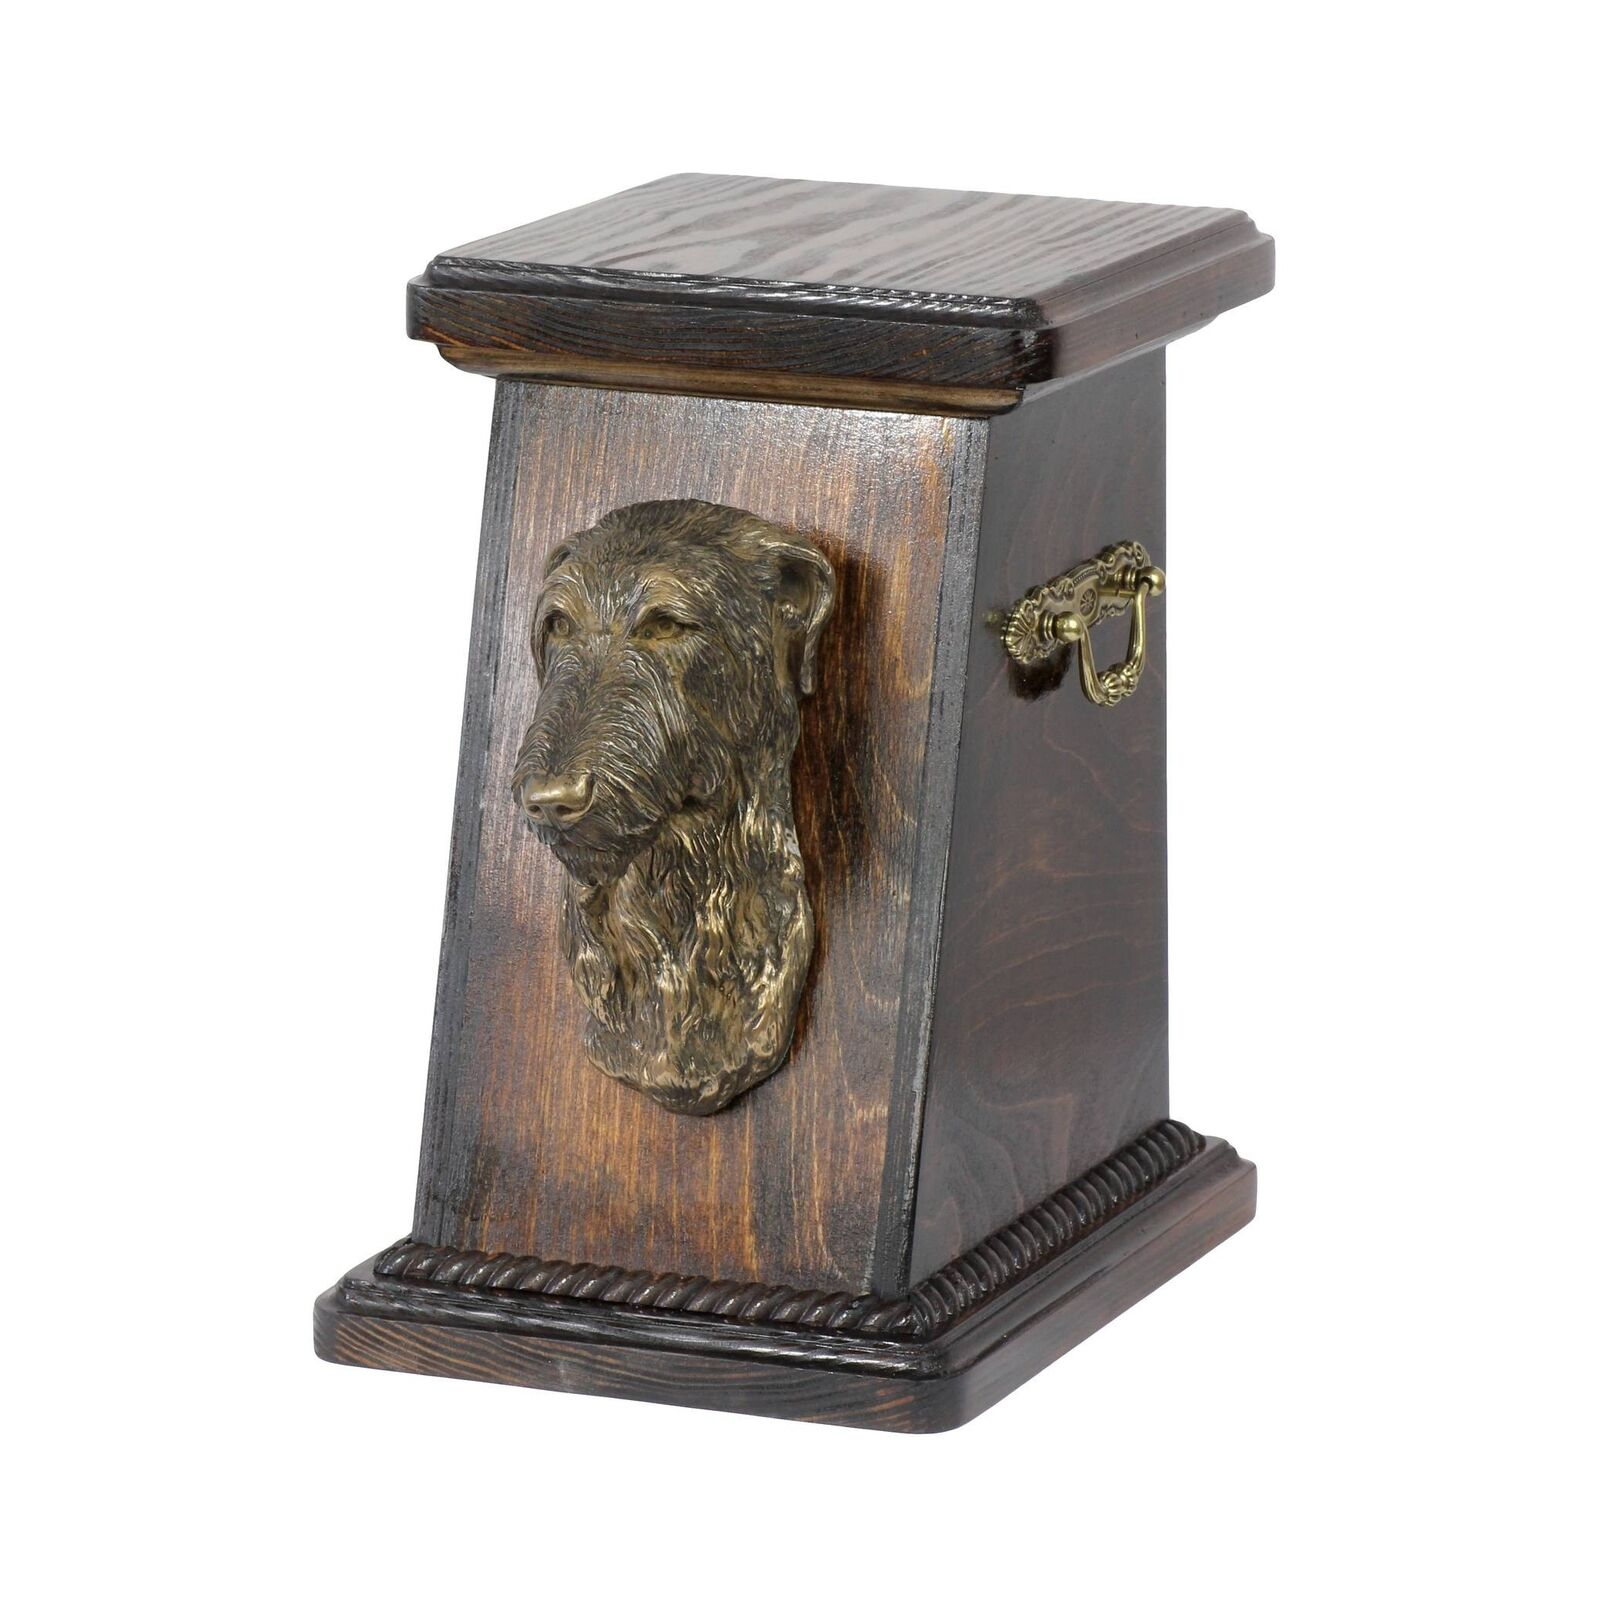 Deerhound - urna di legno con l'immagine di un cane Art Dog IT Tipo 3